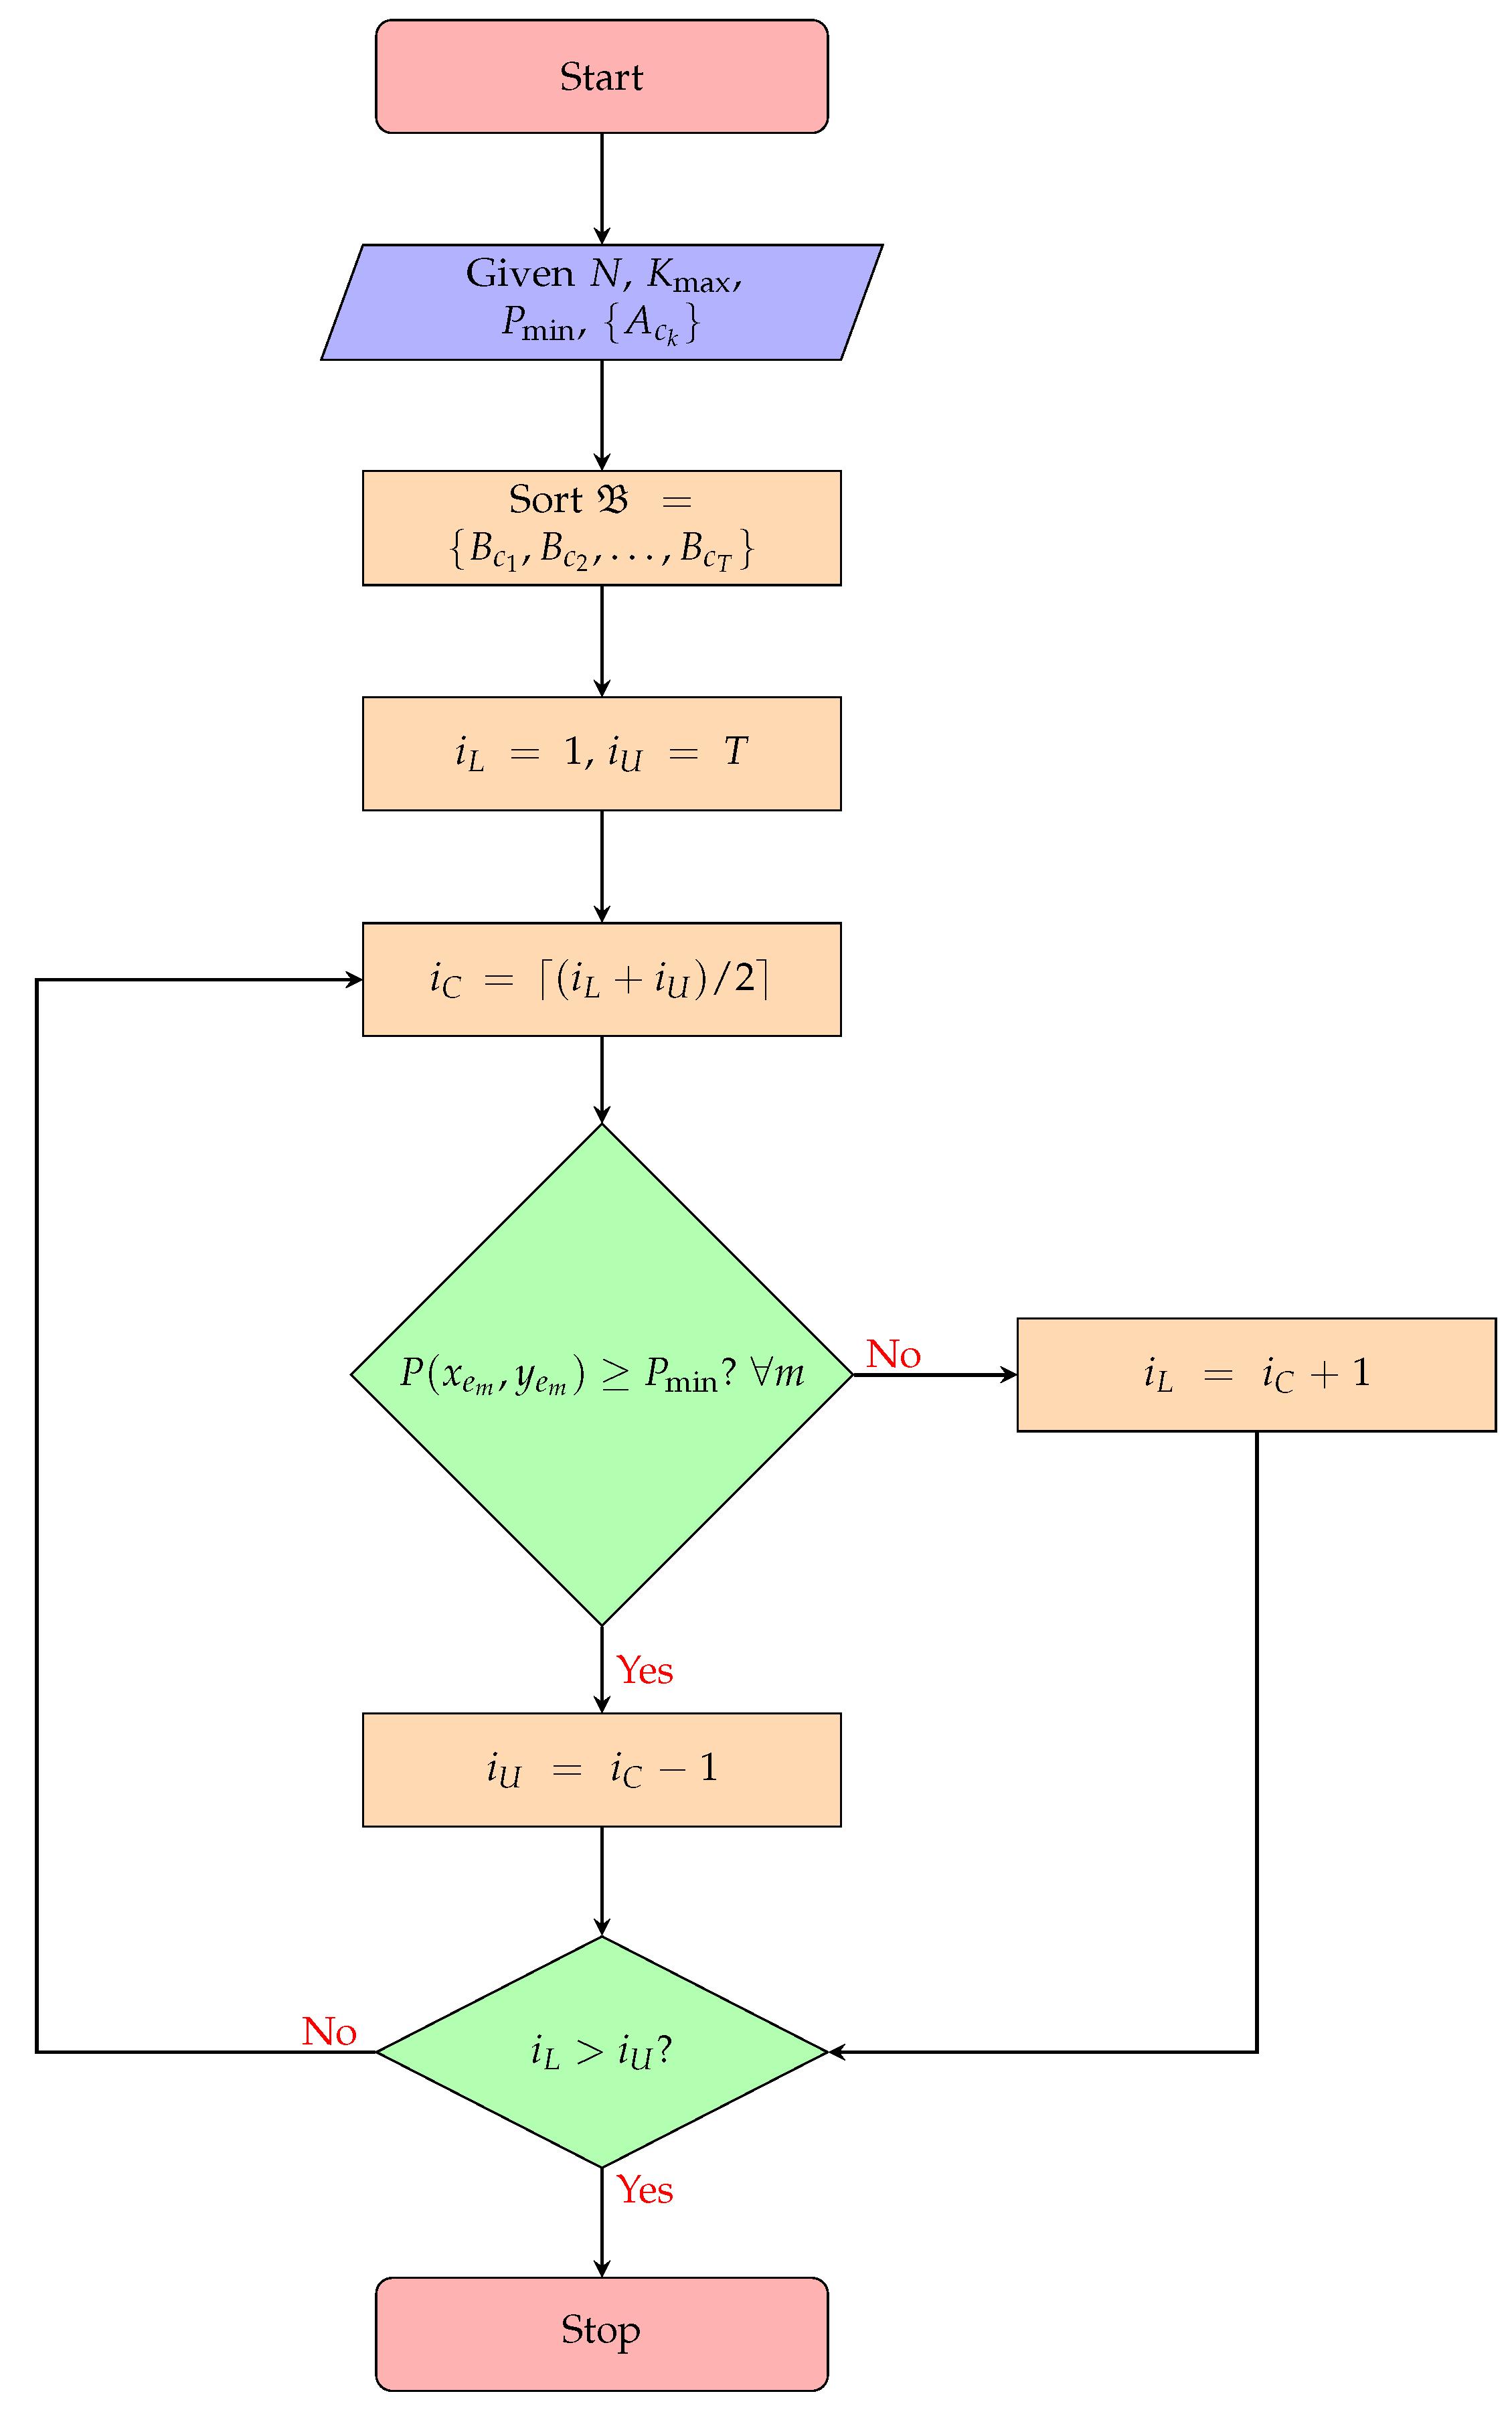 hydraulic flow chart meaning of production process swot analysis euclidean algorithm flowchart basic flowchart grease tank - Bubble Sort Algorithm Flowchart